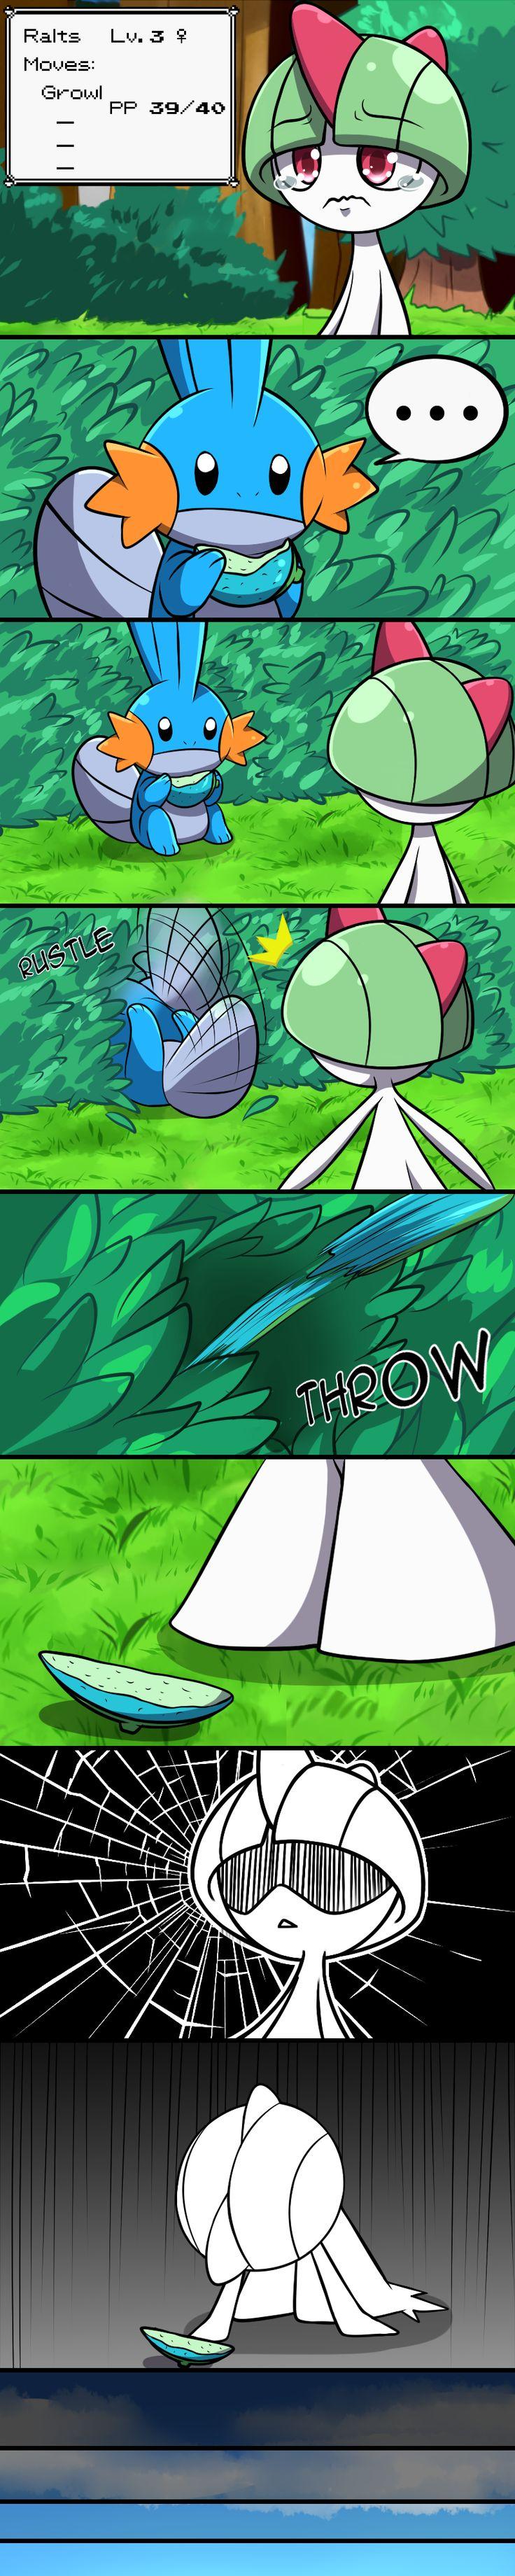 best pokemon images on pinterest pokemon stuff videogames